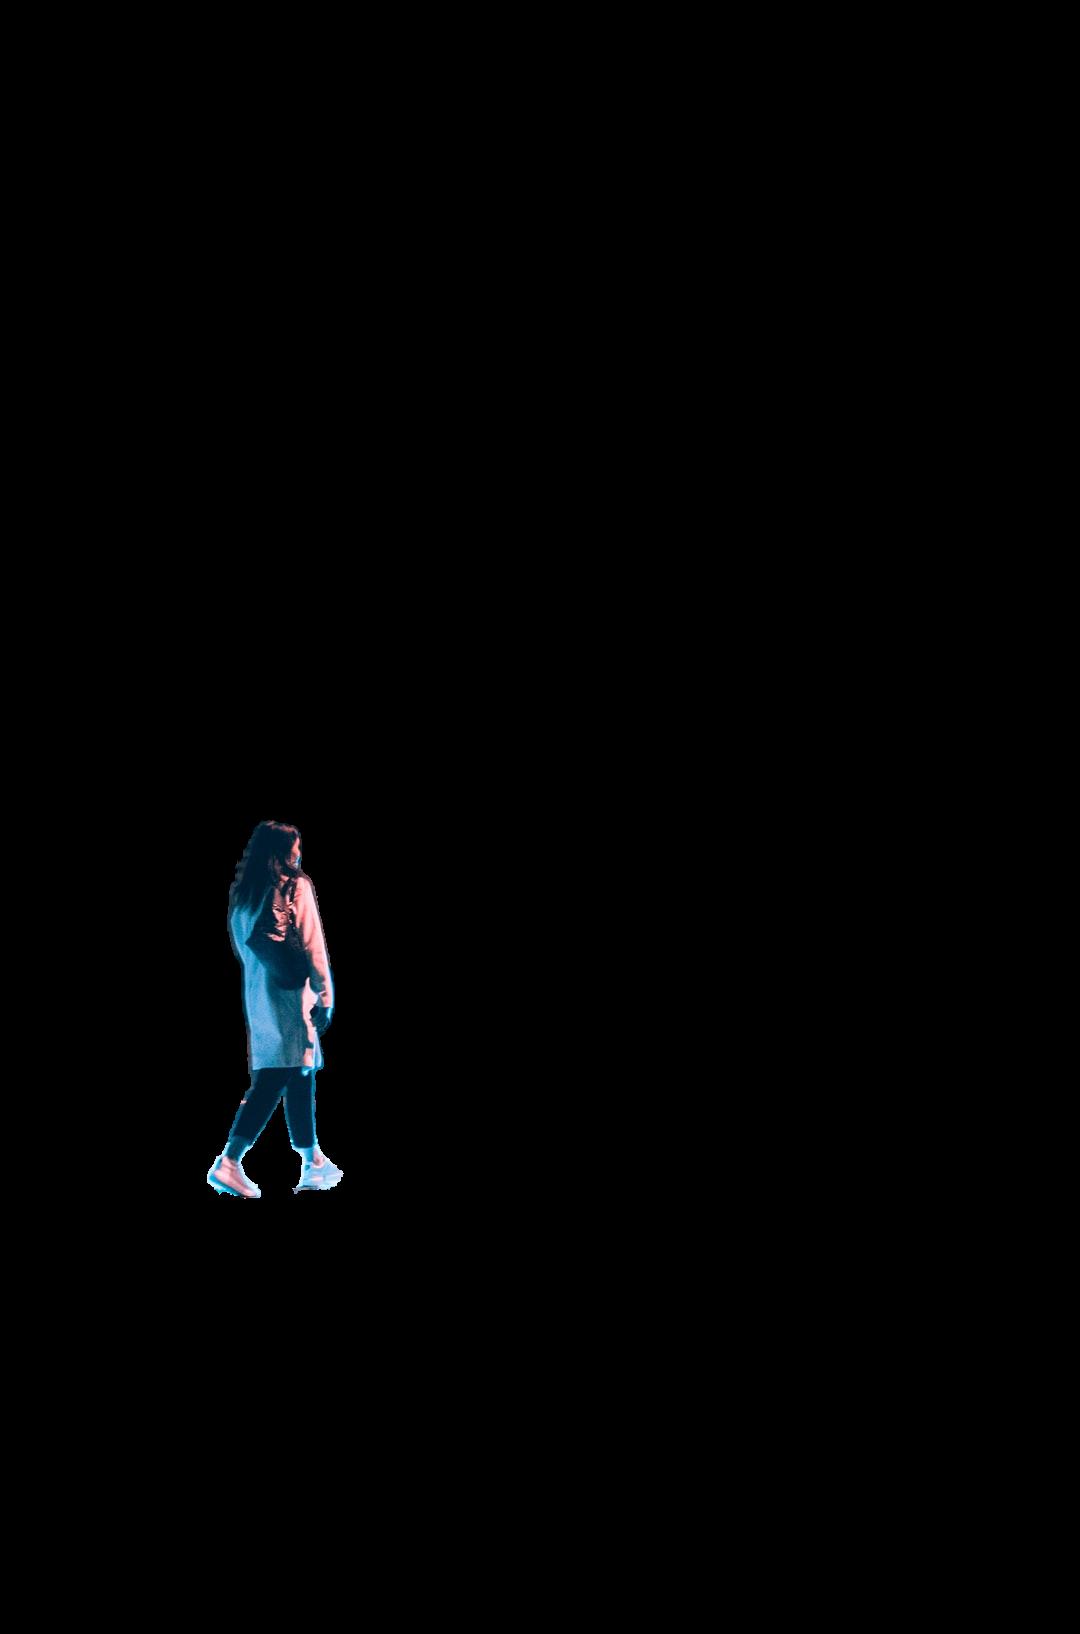 woman in white long sleeve shirt and black pants walking on sidewalk during daytime